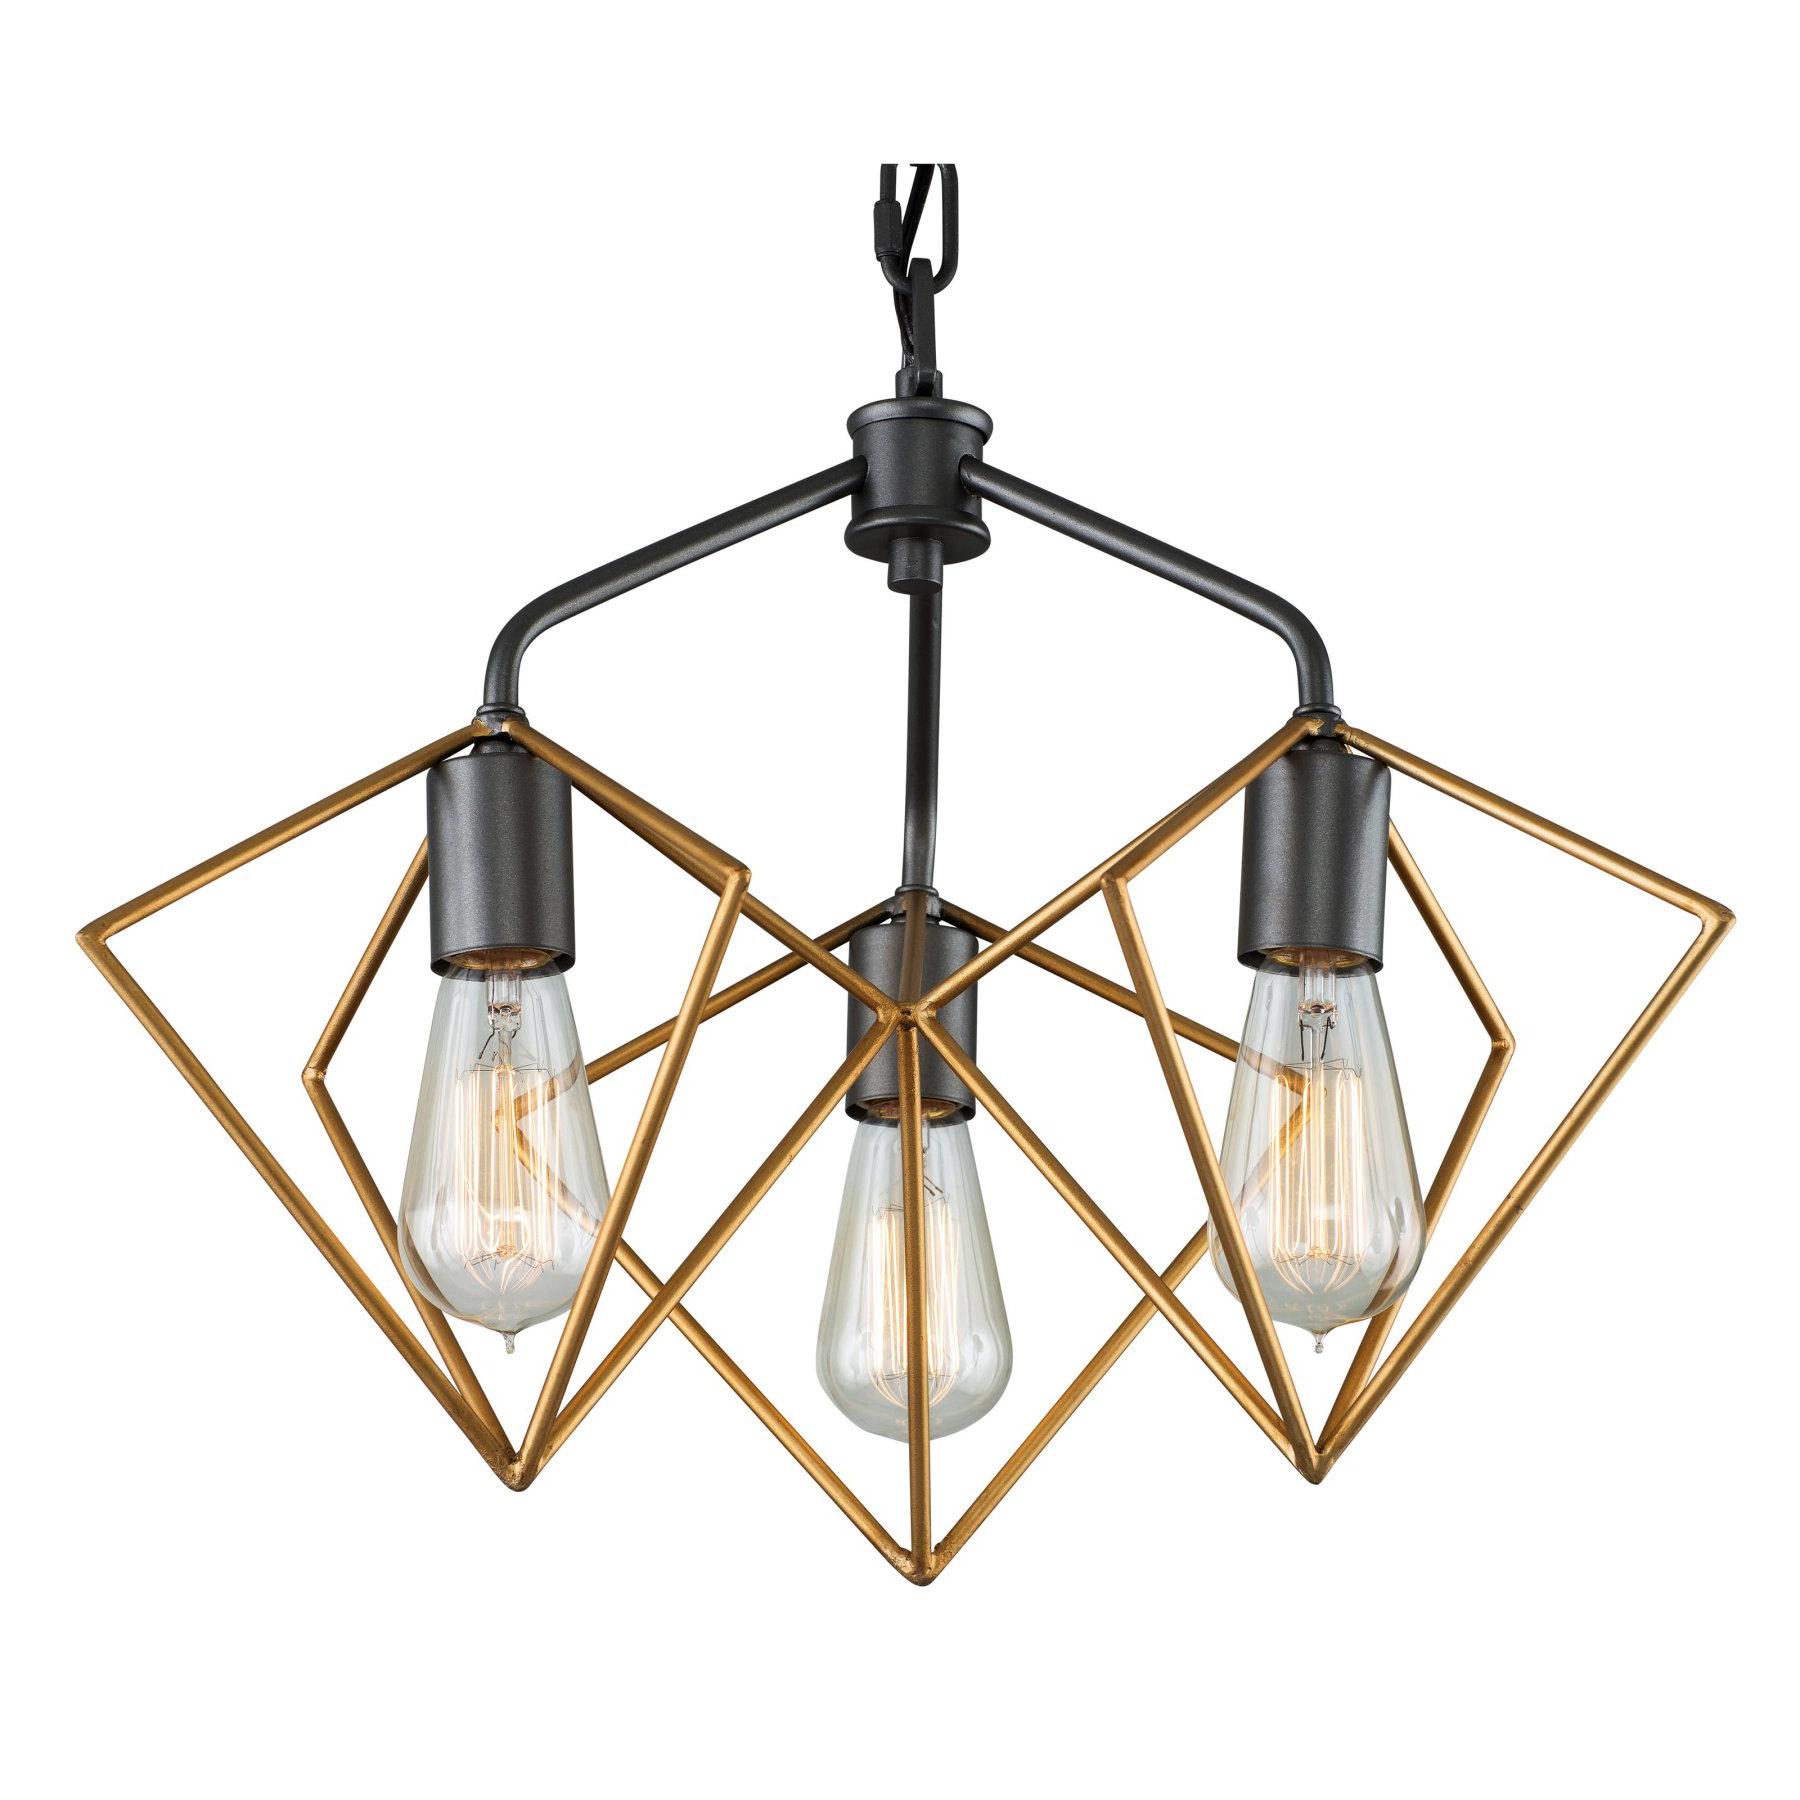 Fashionable Hewitt 4 Light Square Chandeliers Throughout Varaluz Metropolis 261P03Agrb Pendant Light – 261P03Agrb (View 11 of 25)